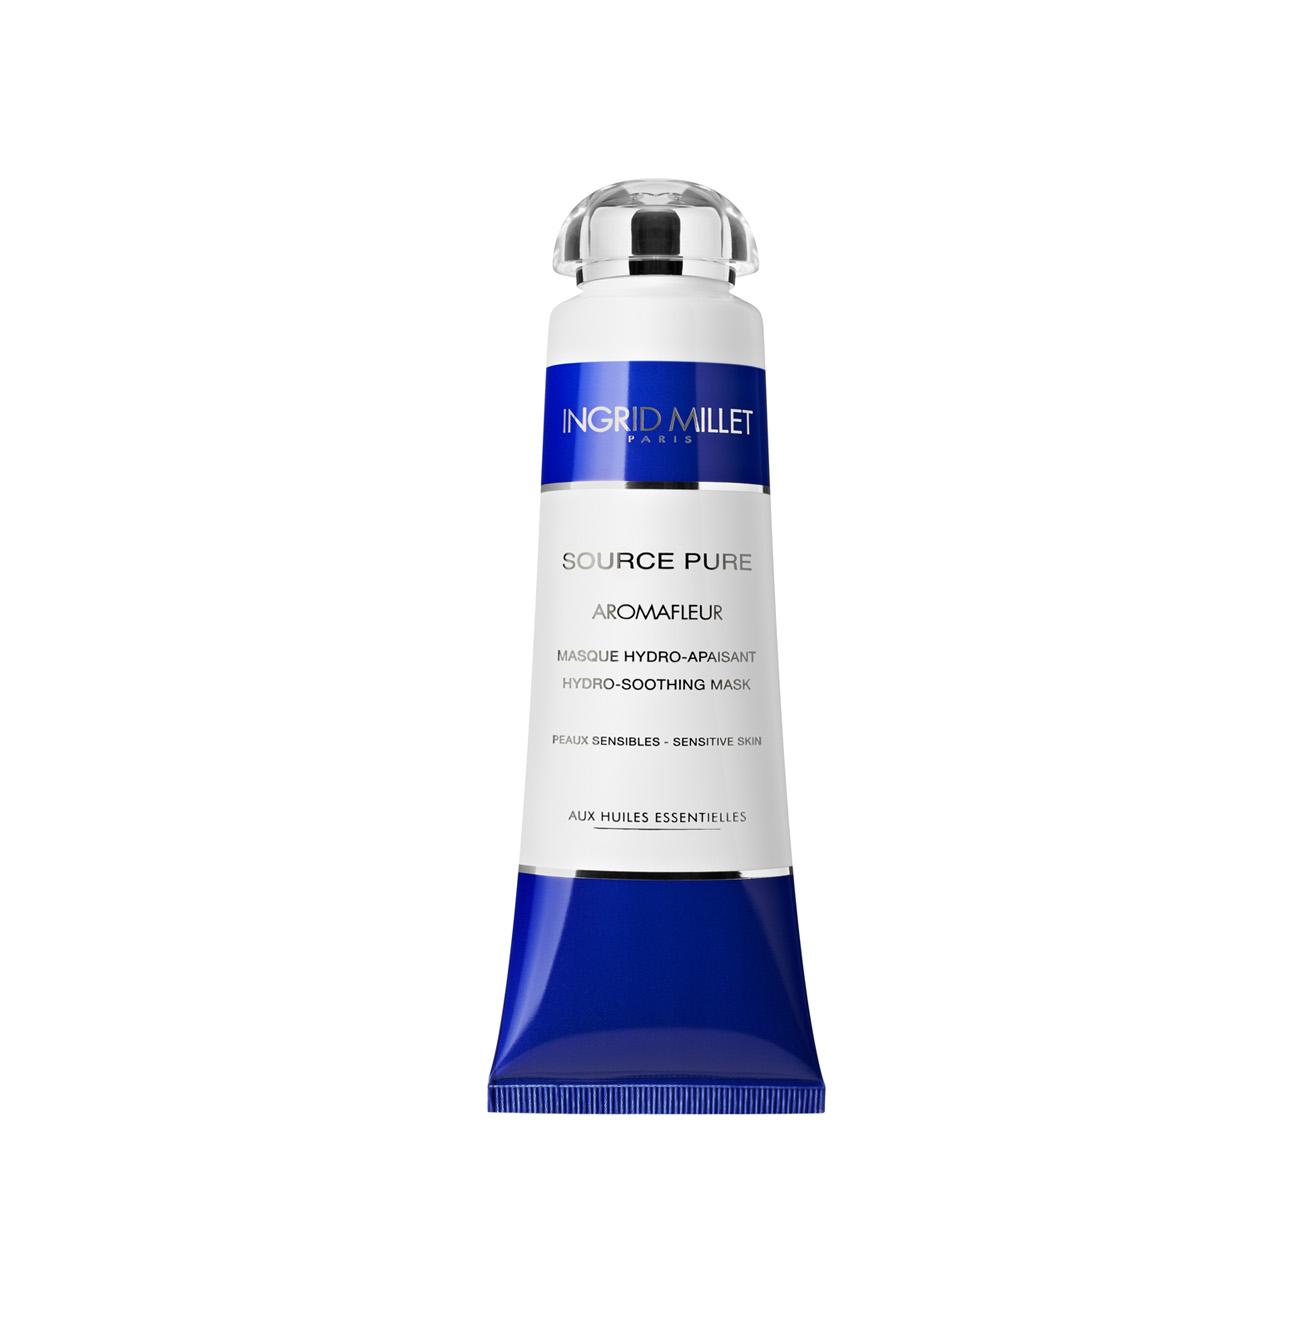 3-Masque-Hydro-Apaisante-Maschera-idratante-pelli-sensibili-Ingrid-Millet-Cosmetici-Source-Pure-Linea-Aromafleur-Dispar-SpA.jpg